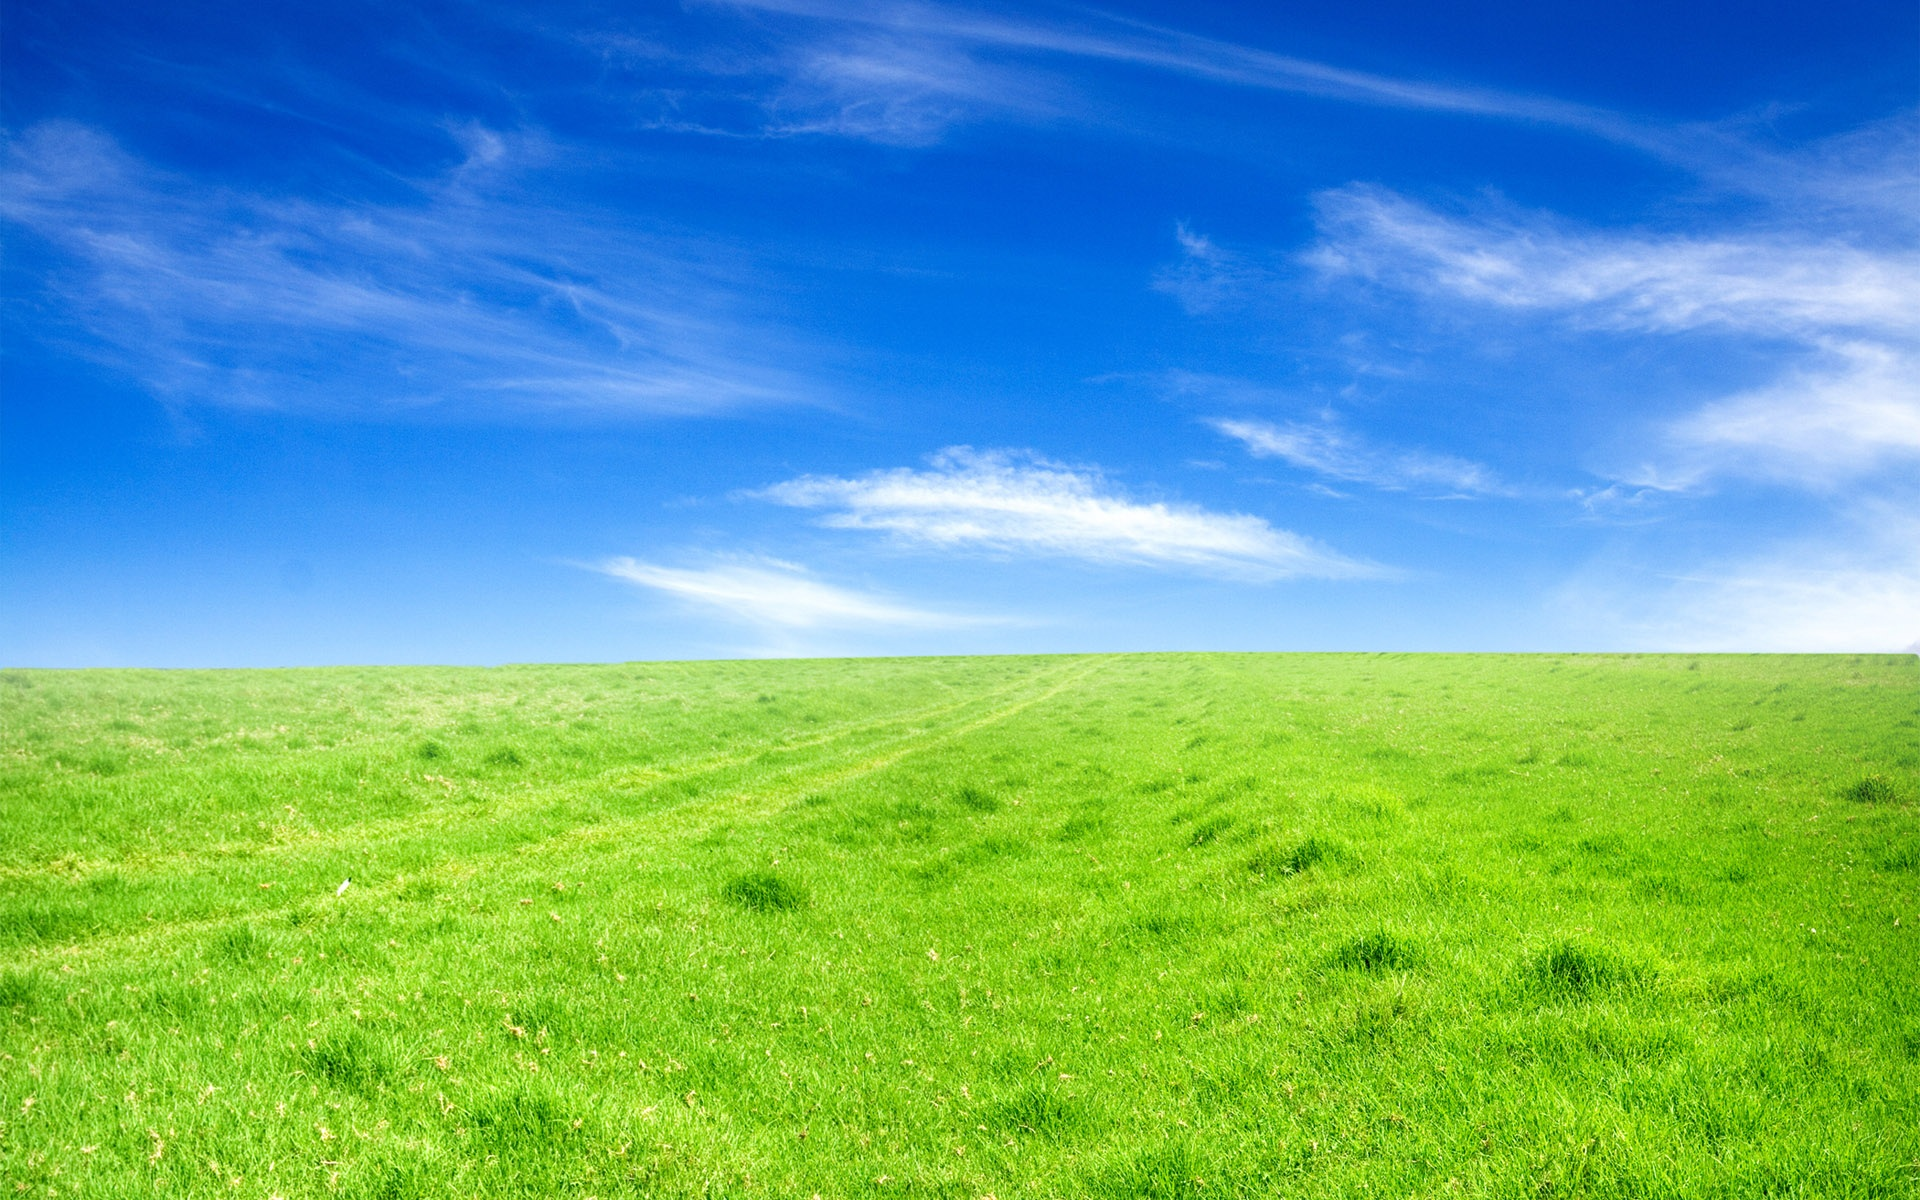 Wallpaper Green grass blue sky 1920x1200 HD Picture Image